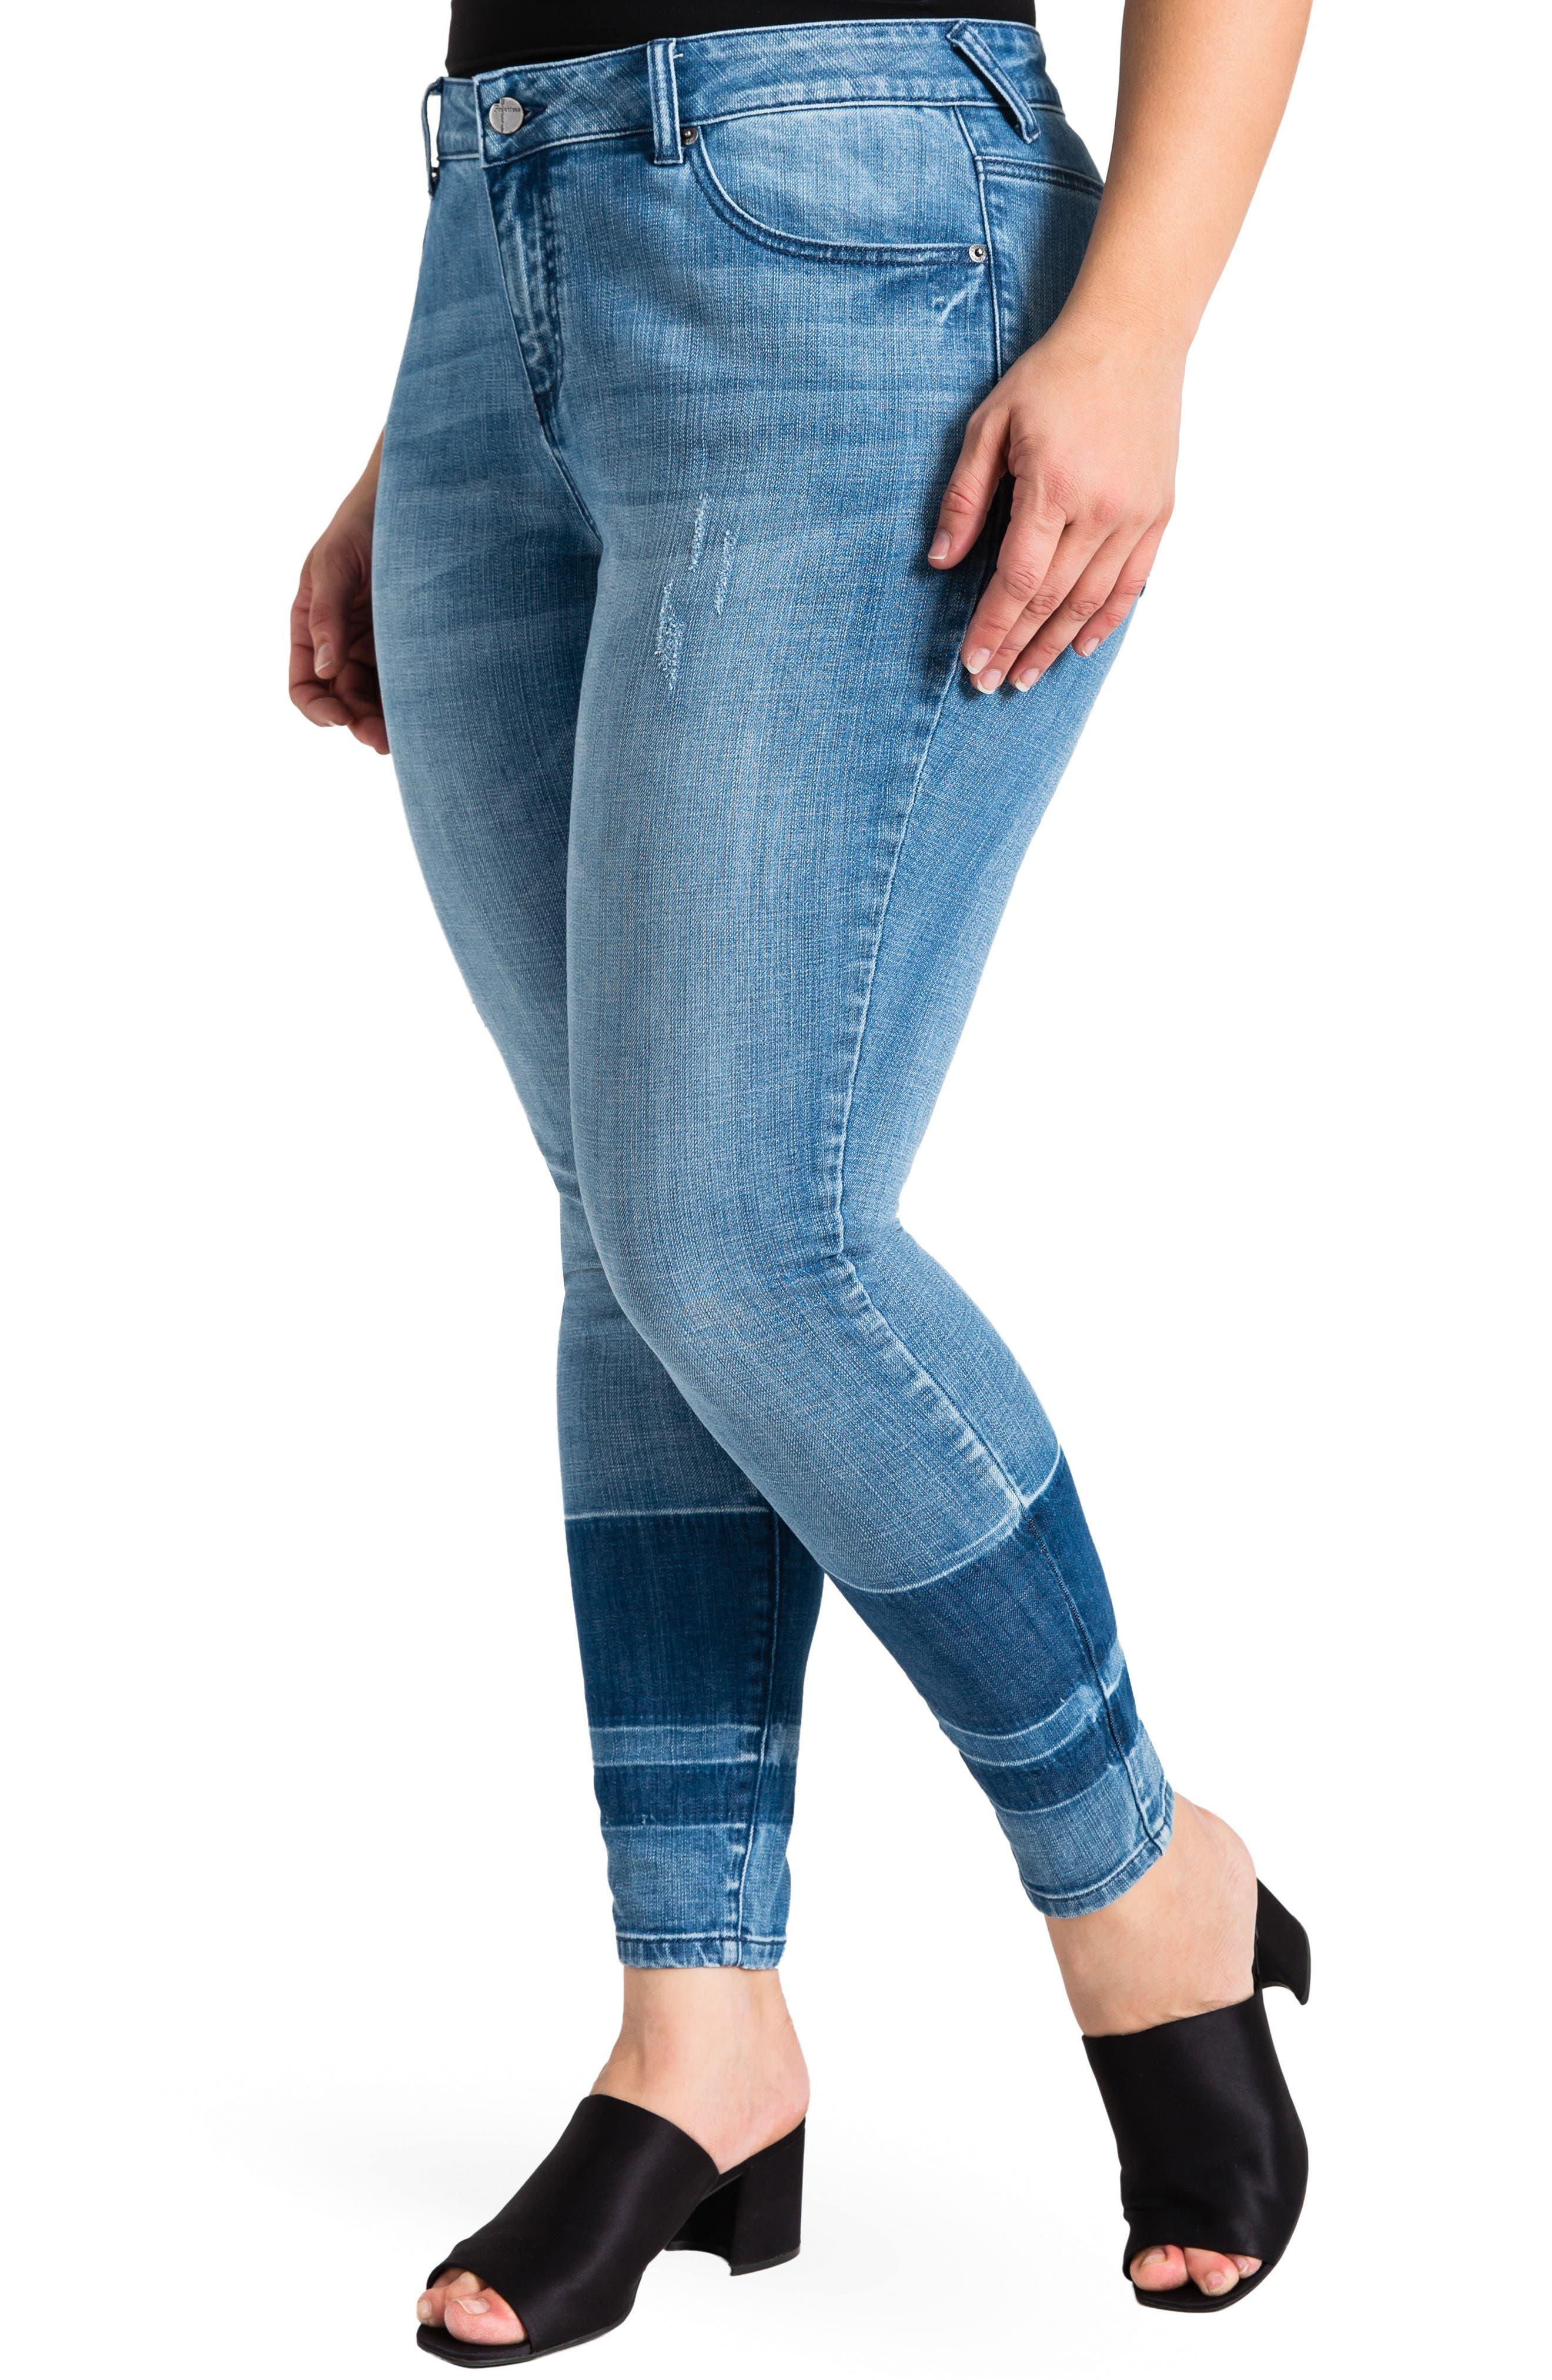 Virginia Ankle Skinny Jeans,                             Main thumbnail 1, color,                             MEDIUM BLUE